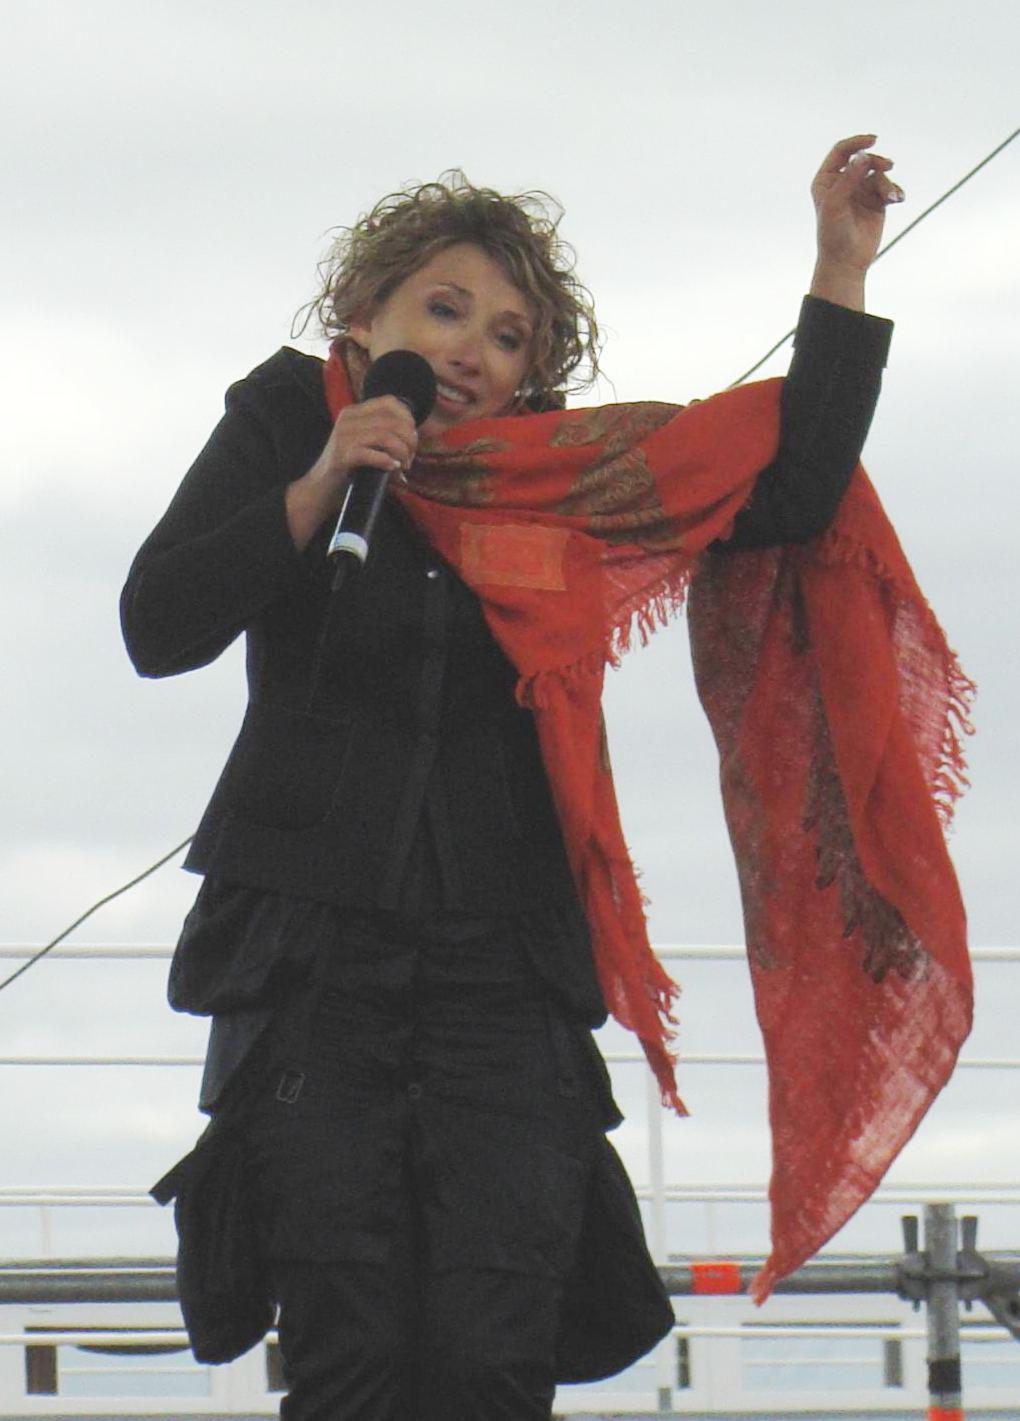 File:Елена Воробей , 28 июня 2009 года, Архангельск (4) JPG